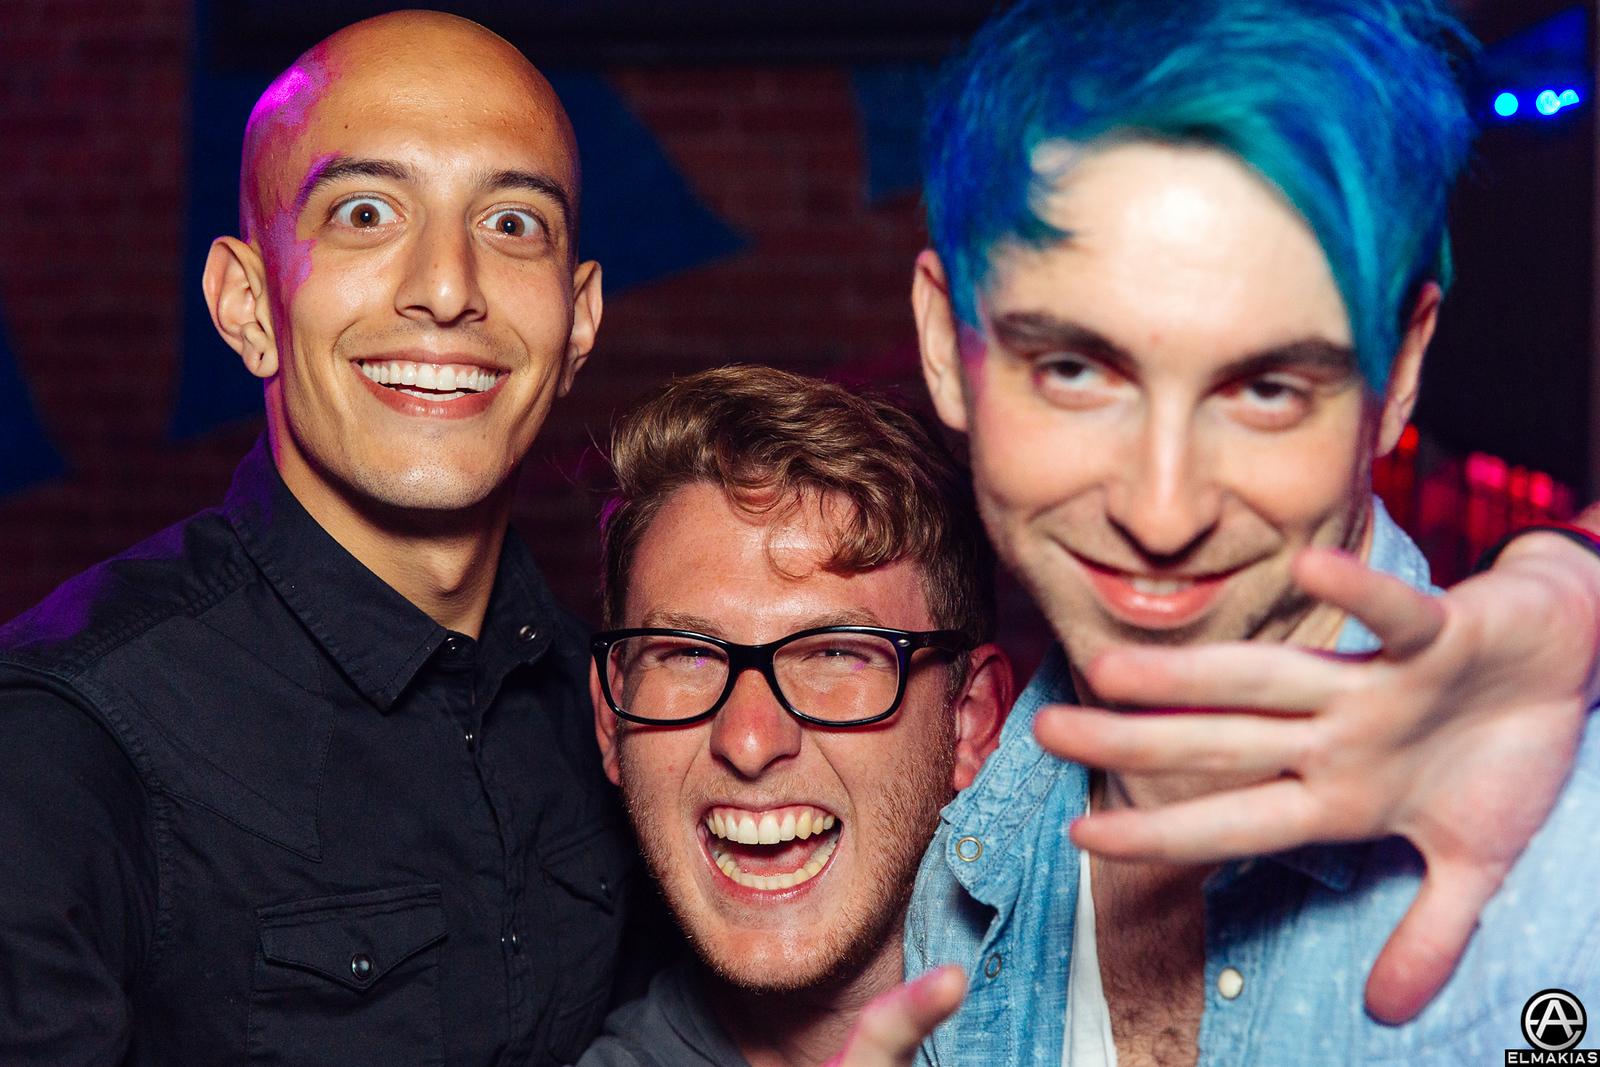 Adam Elmakias, Thomas Falcone and Alex Gaskarth of All Time Low at the 2015 APMAs by Adam Elmakias